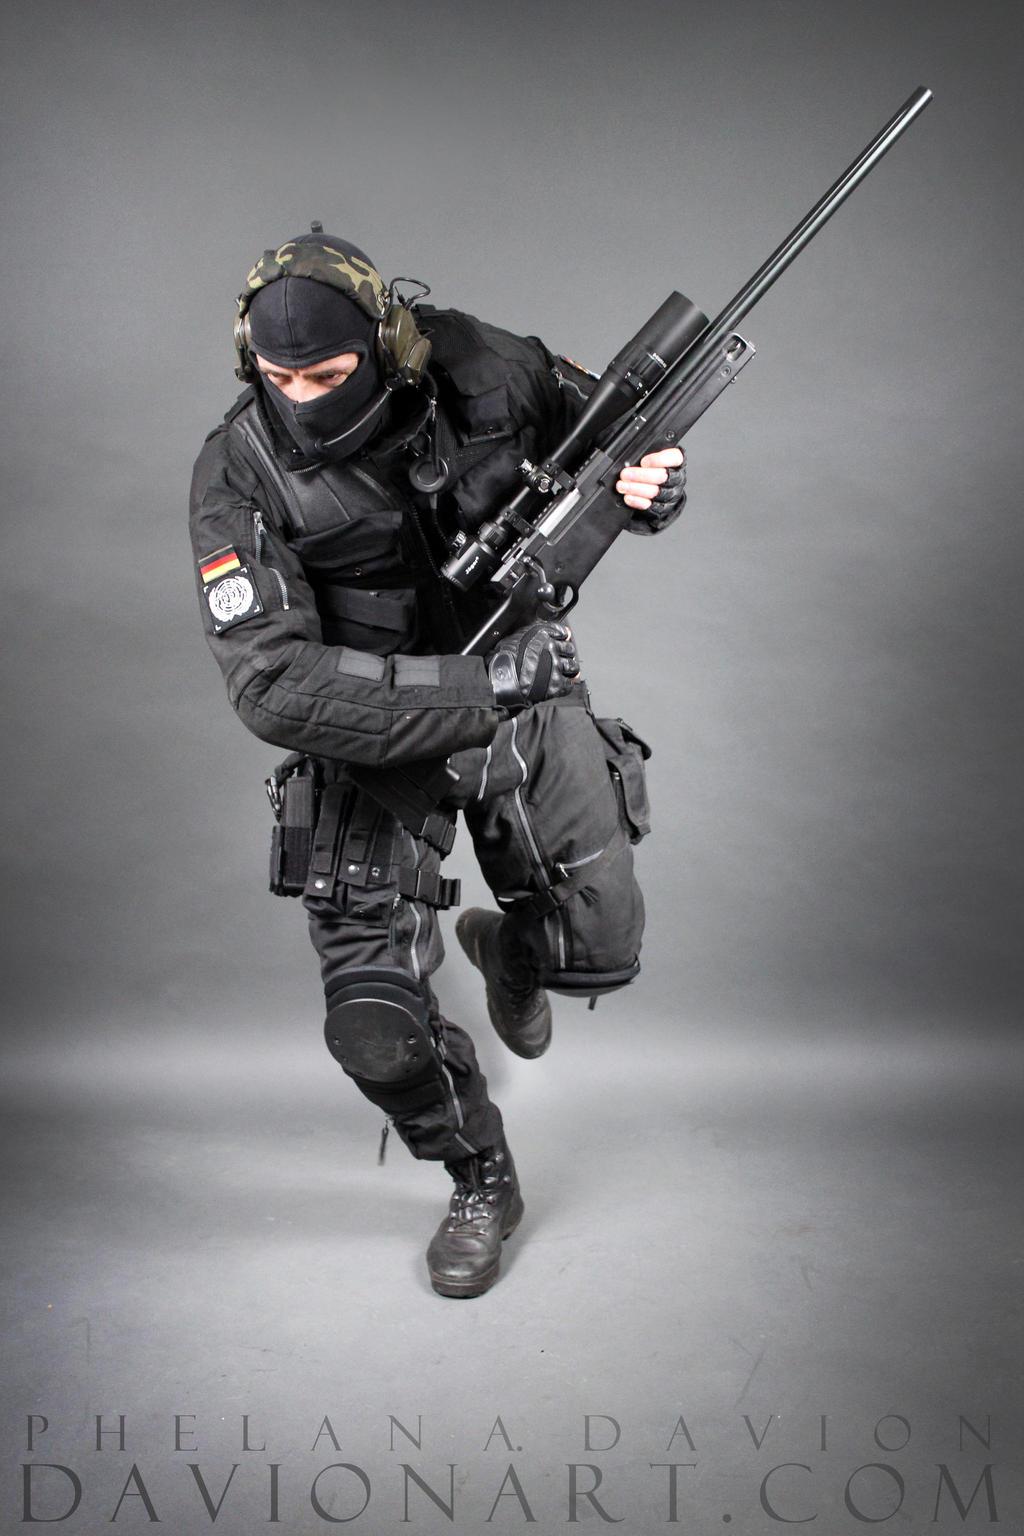 Sniper STOCK XX by PhelanDavion